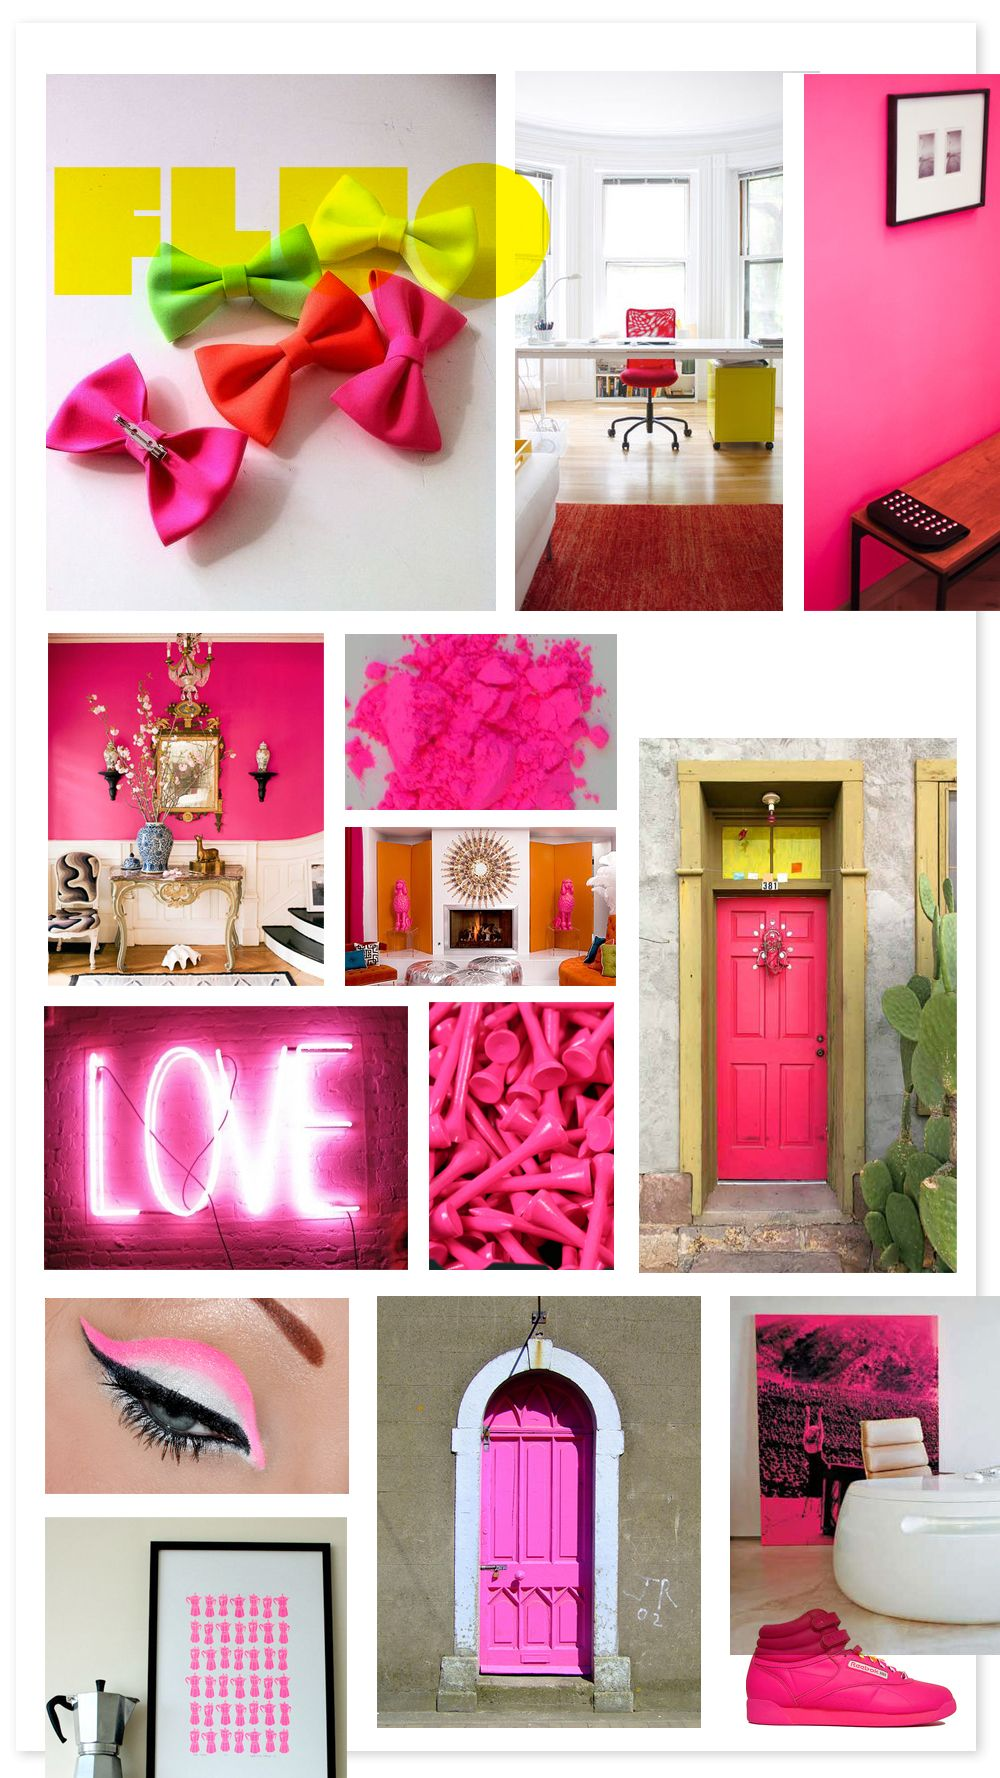 fluor, neon, pink, green, yellow, orange, colors | Decolores ...